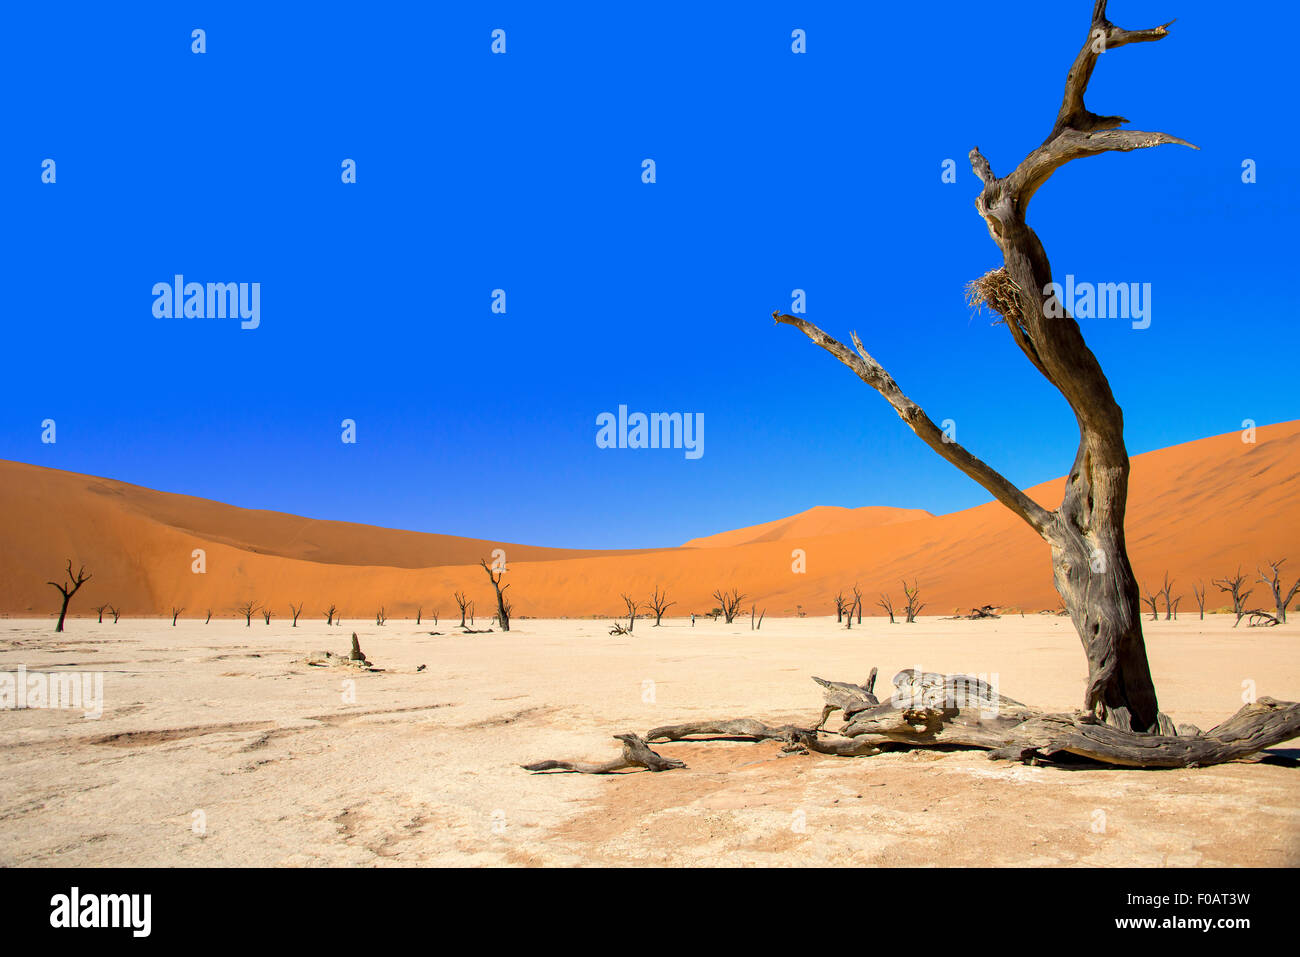 The Dead Viei (DeadVlei) Pan, Namib-Naukluft National Park, Sossusviei, Namib Desert, Hardap Region, Republic of - Stock Image